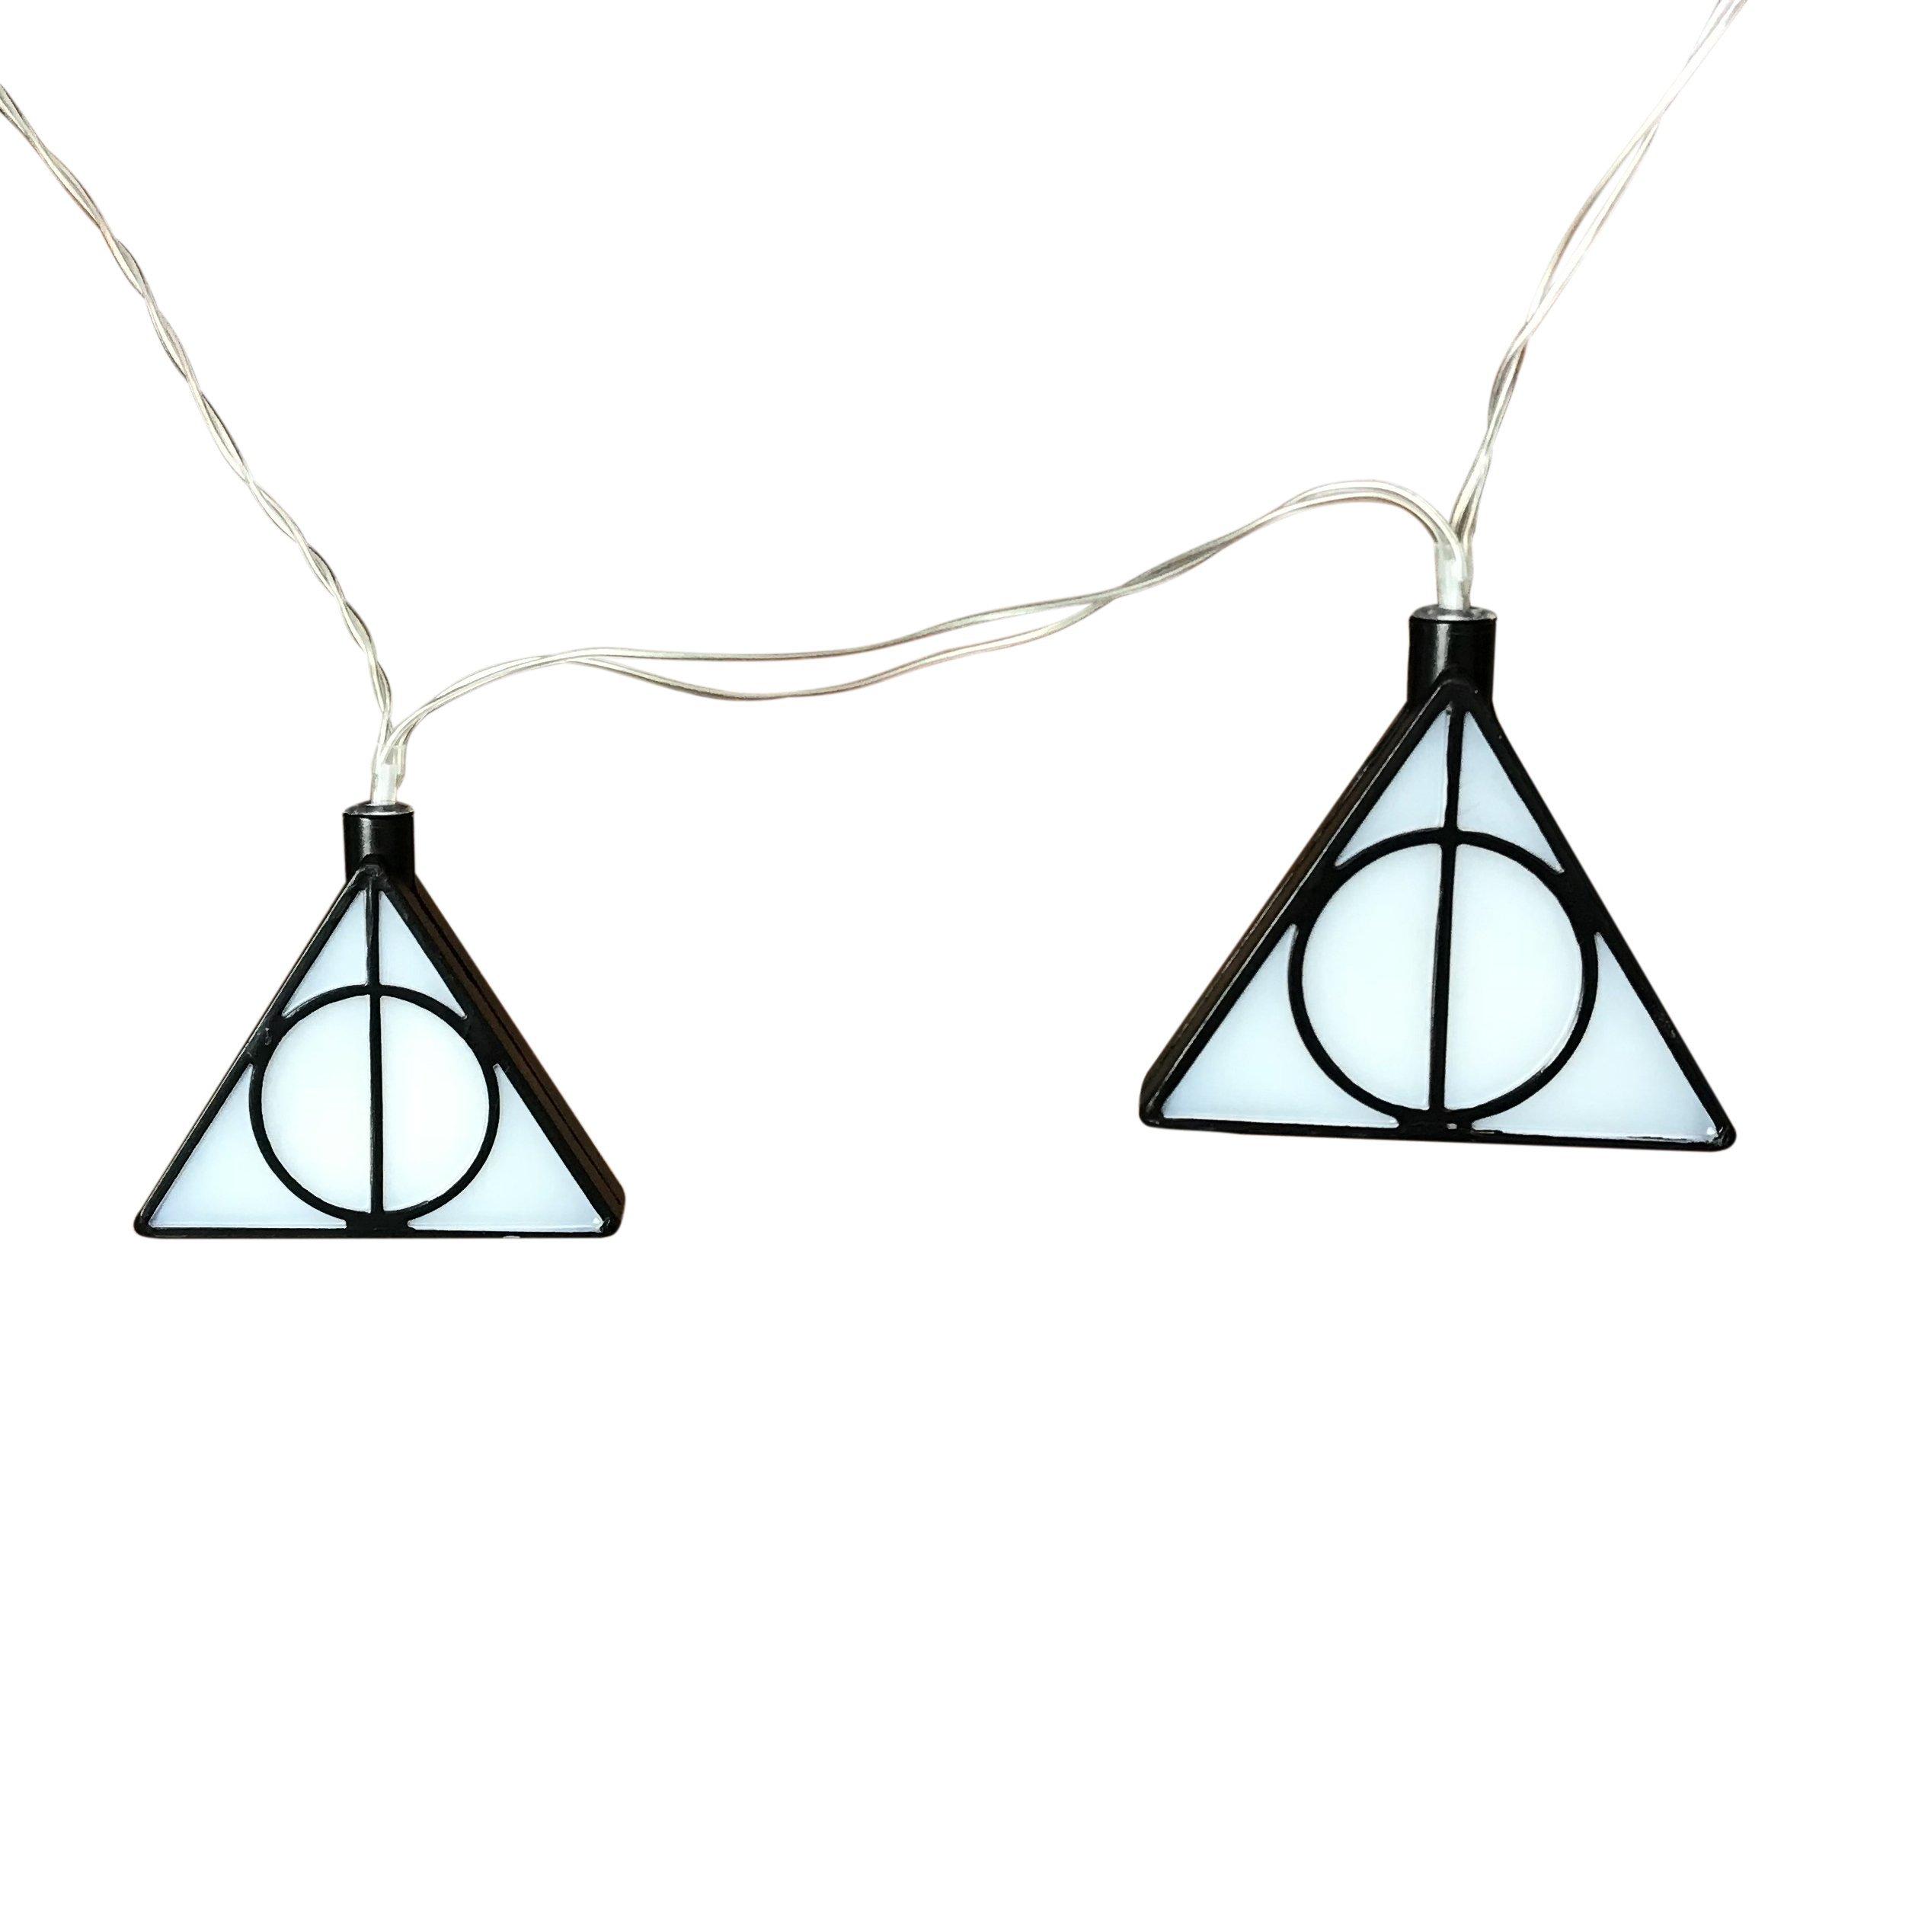 Groovy Uk Deathly Hallows Harry Potter 3D String Lights